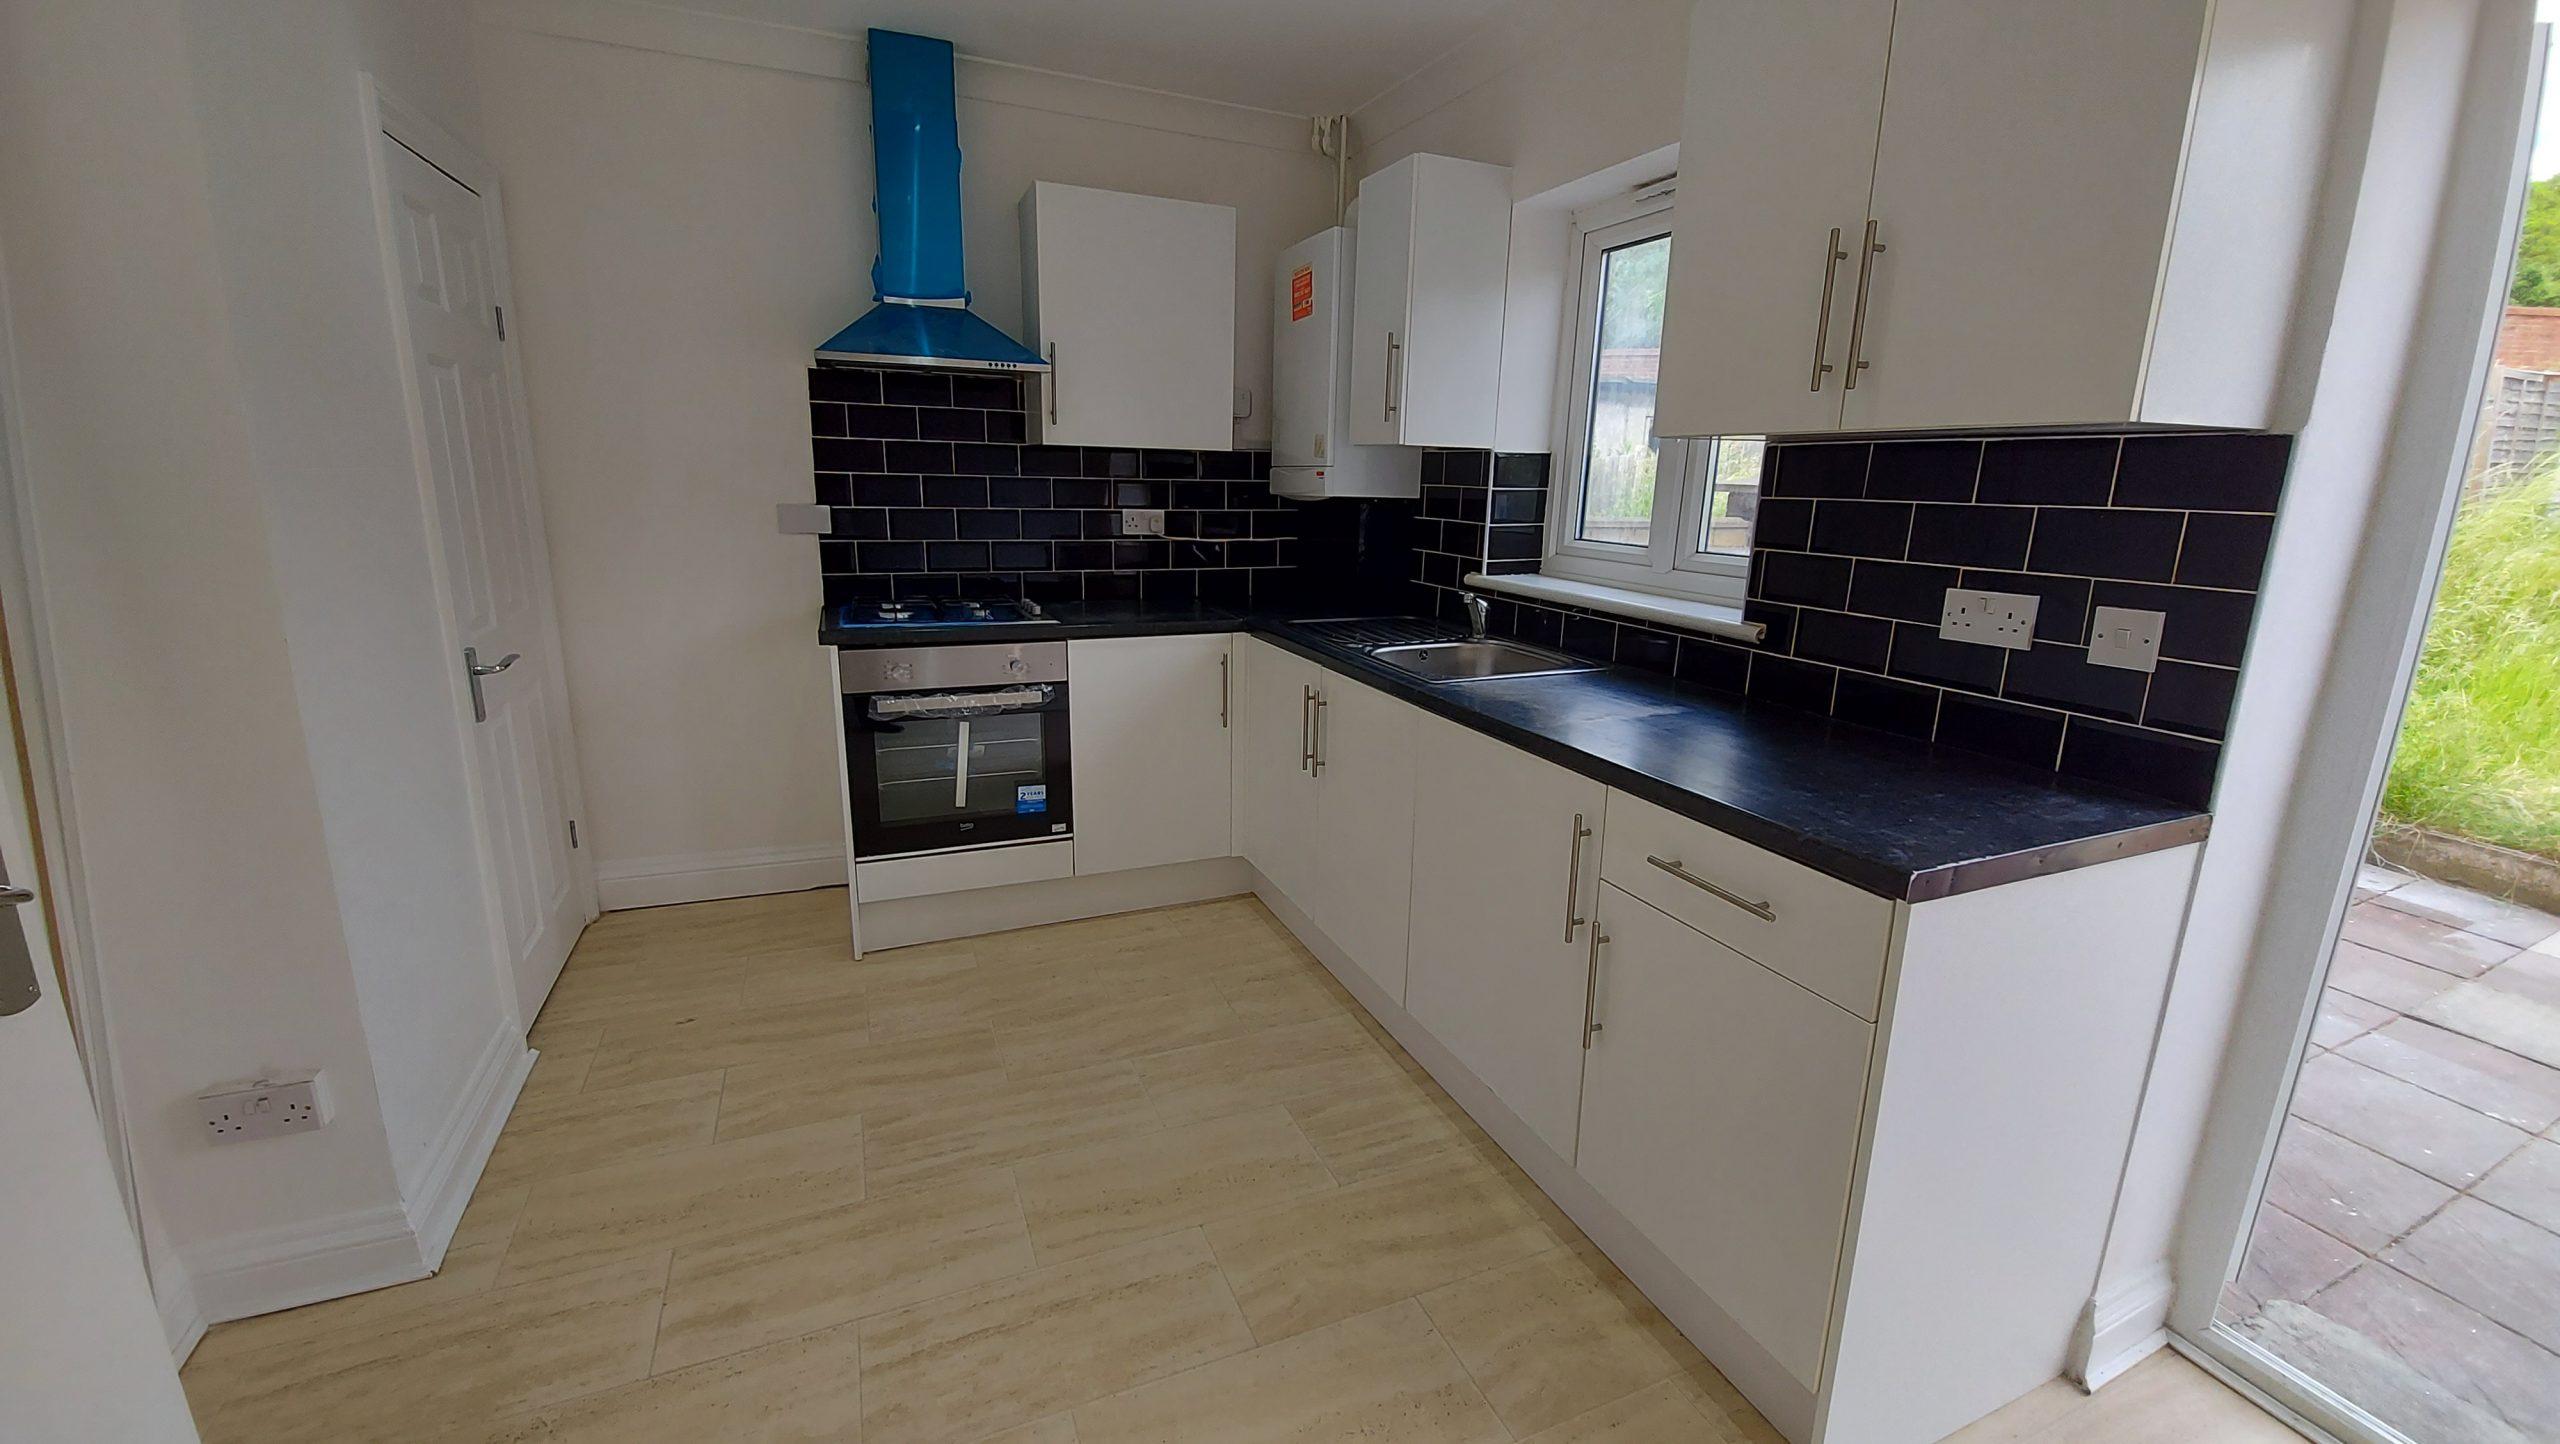 3 Bed House Longacre Road E17 Walthamstow